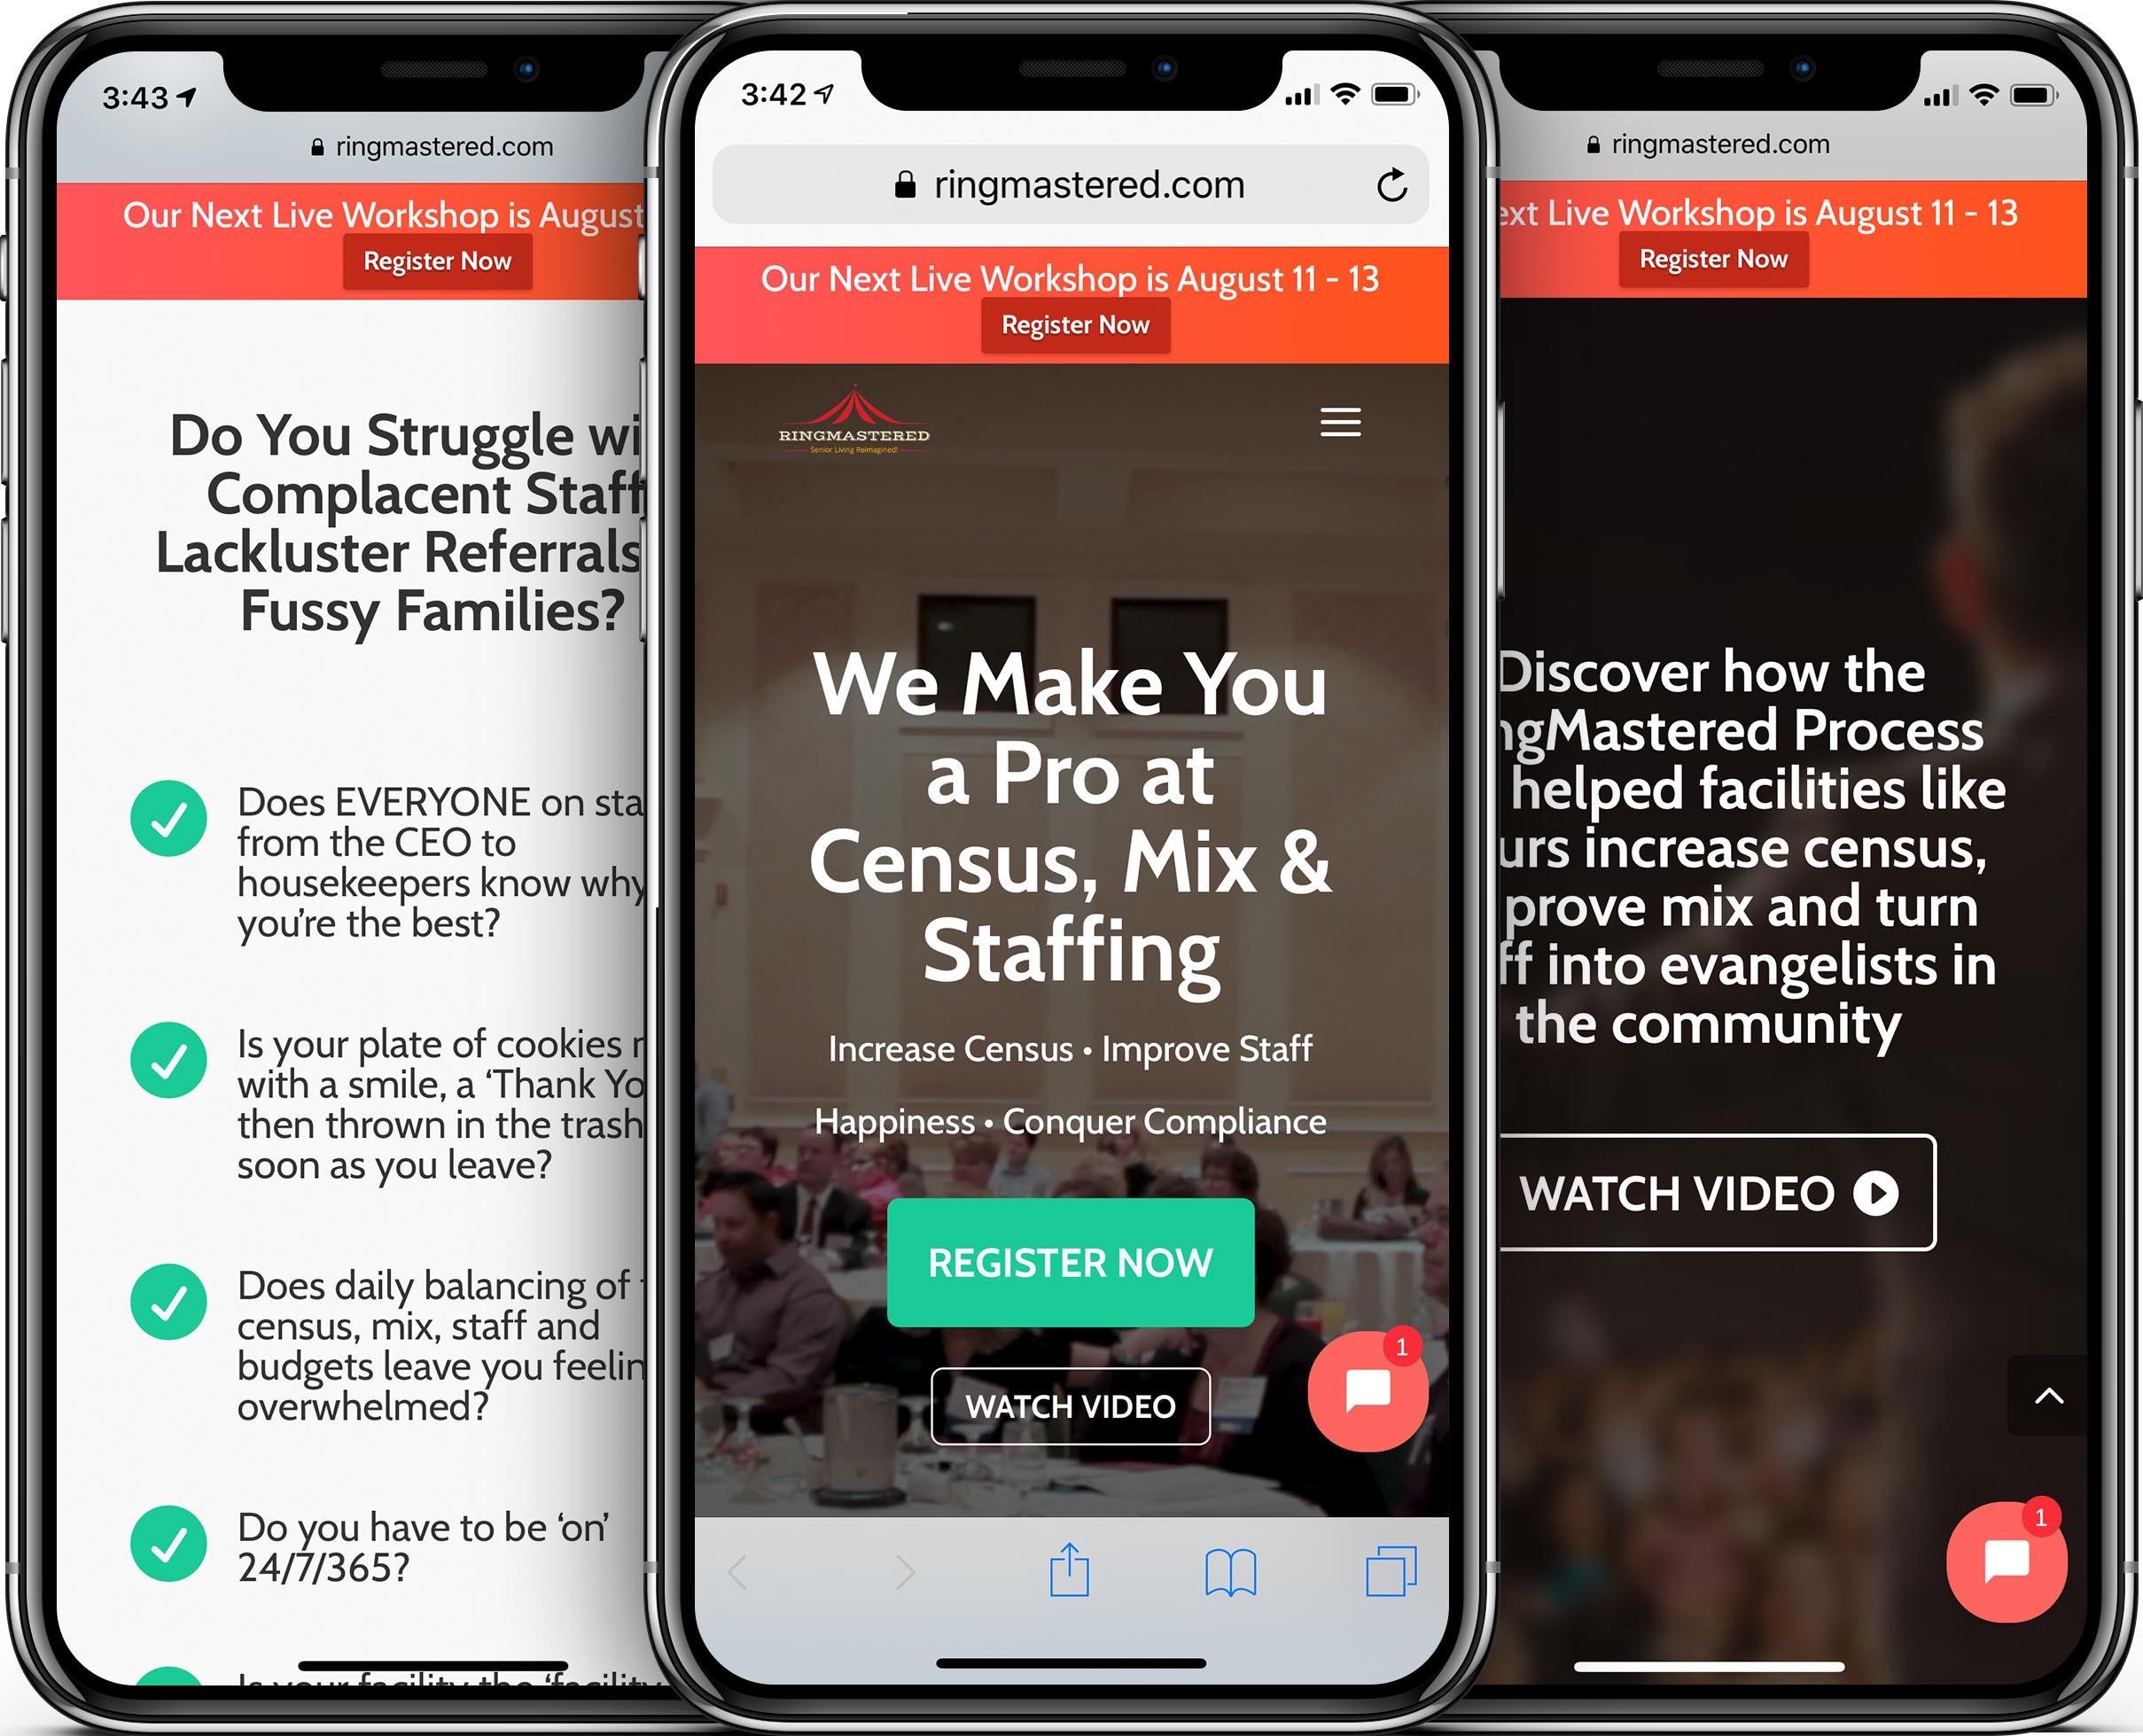 RingMastered Mobile-Friendly Web Design